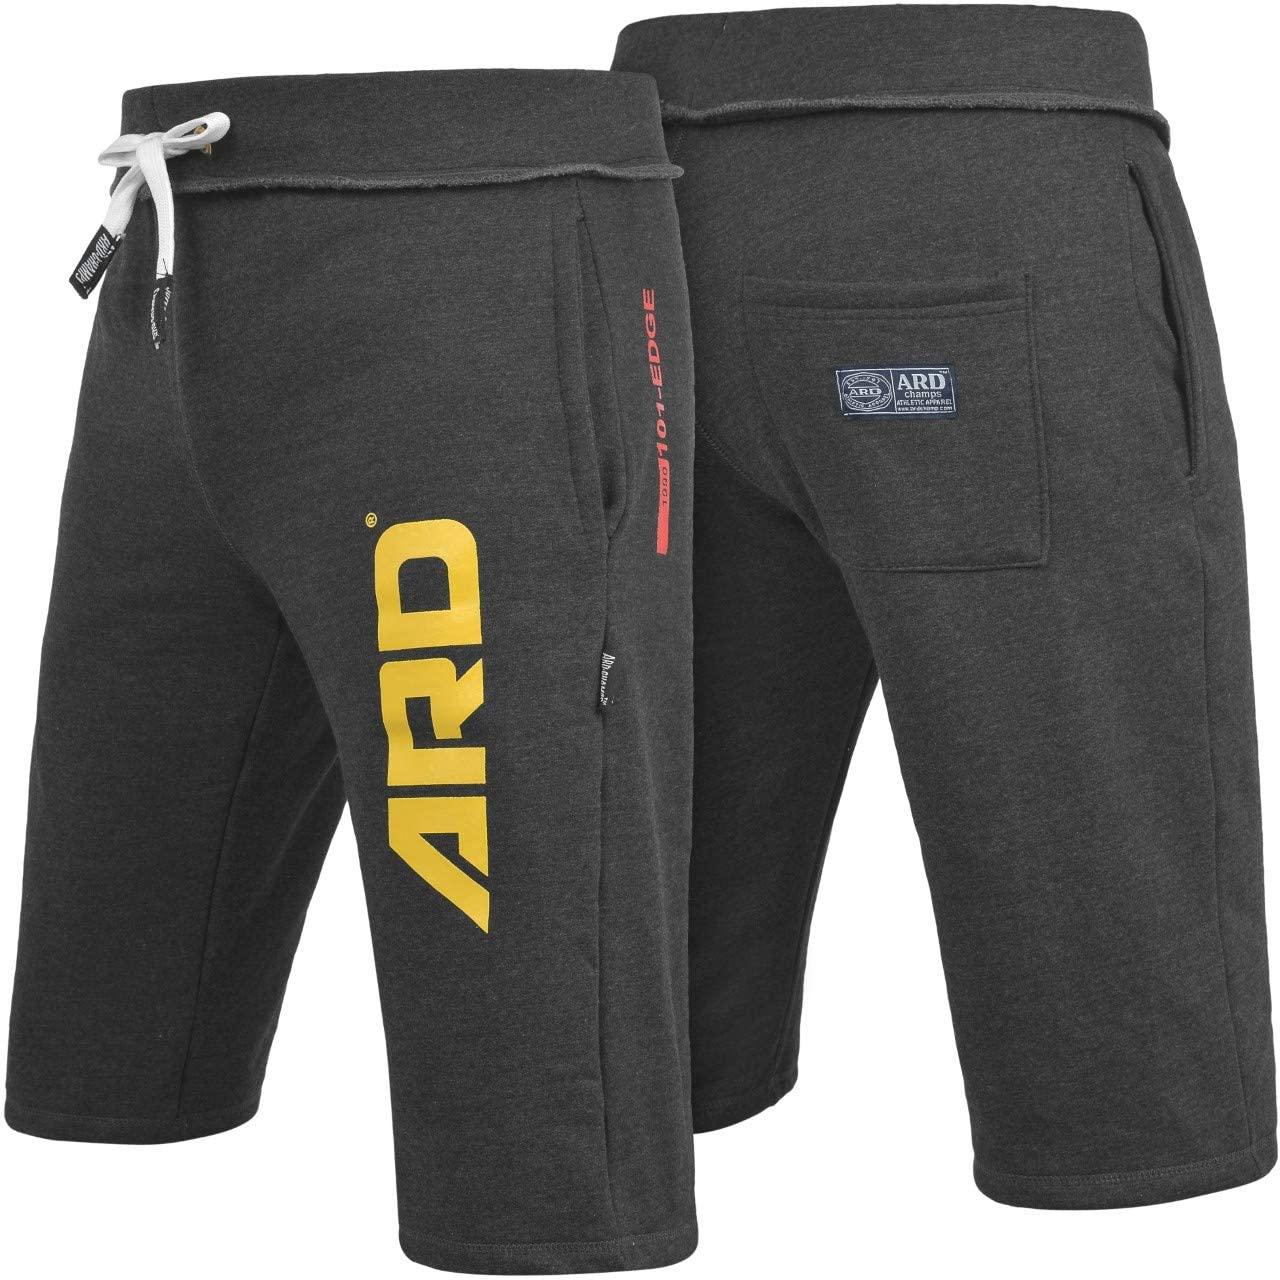 ARD CHAMPS Mens Cotton Fleece Shorts Jogging Casual Home Wear MMA Boxing Martial Art Jogger (S-XXL) (Charcoal, Small)